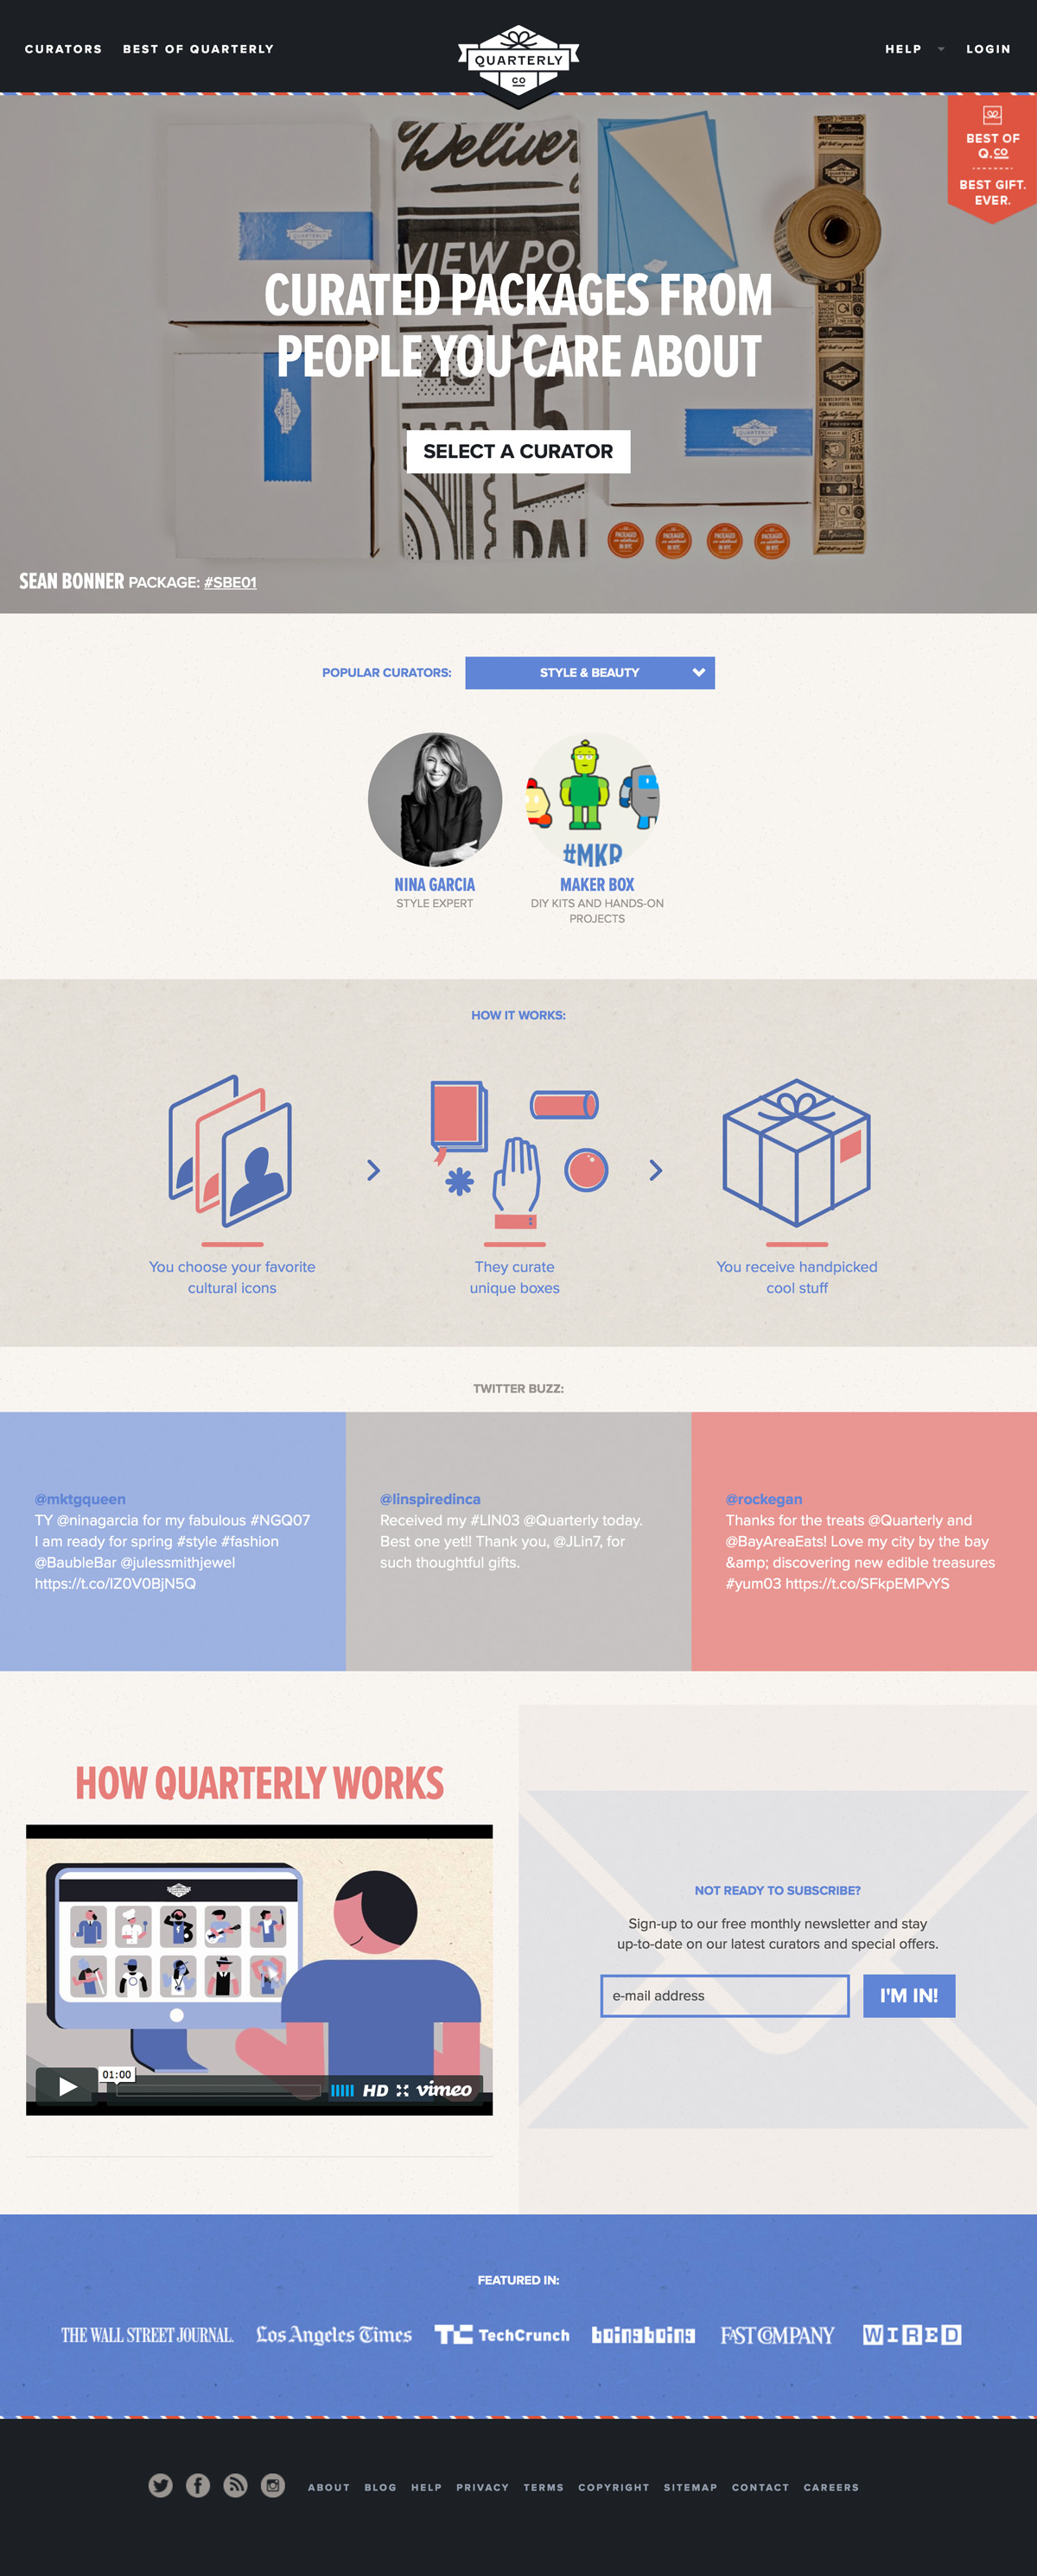 eCommerce website: Quarterly